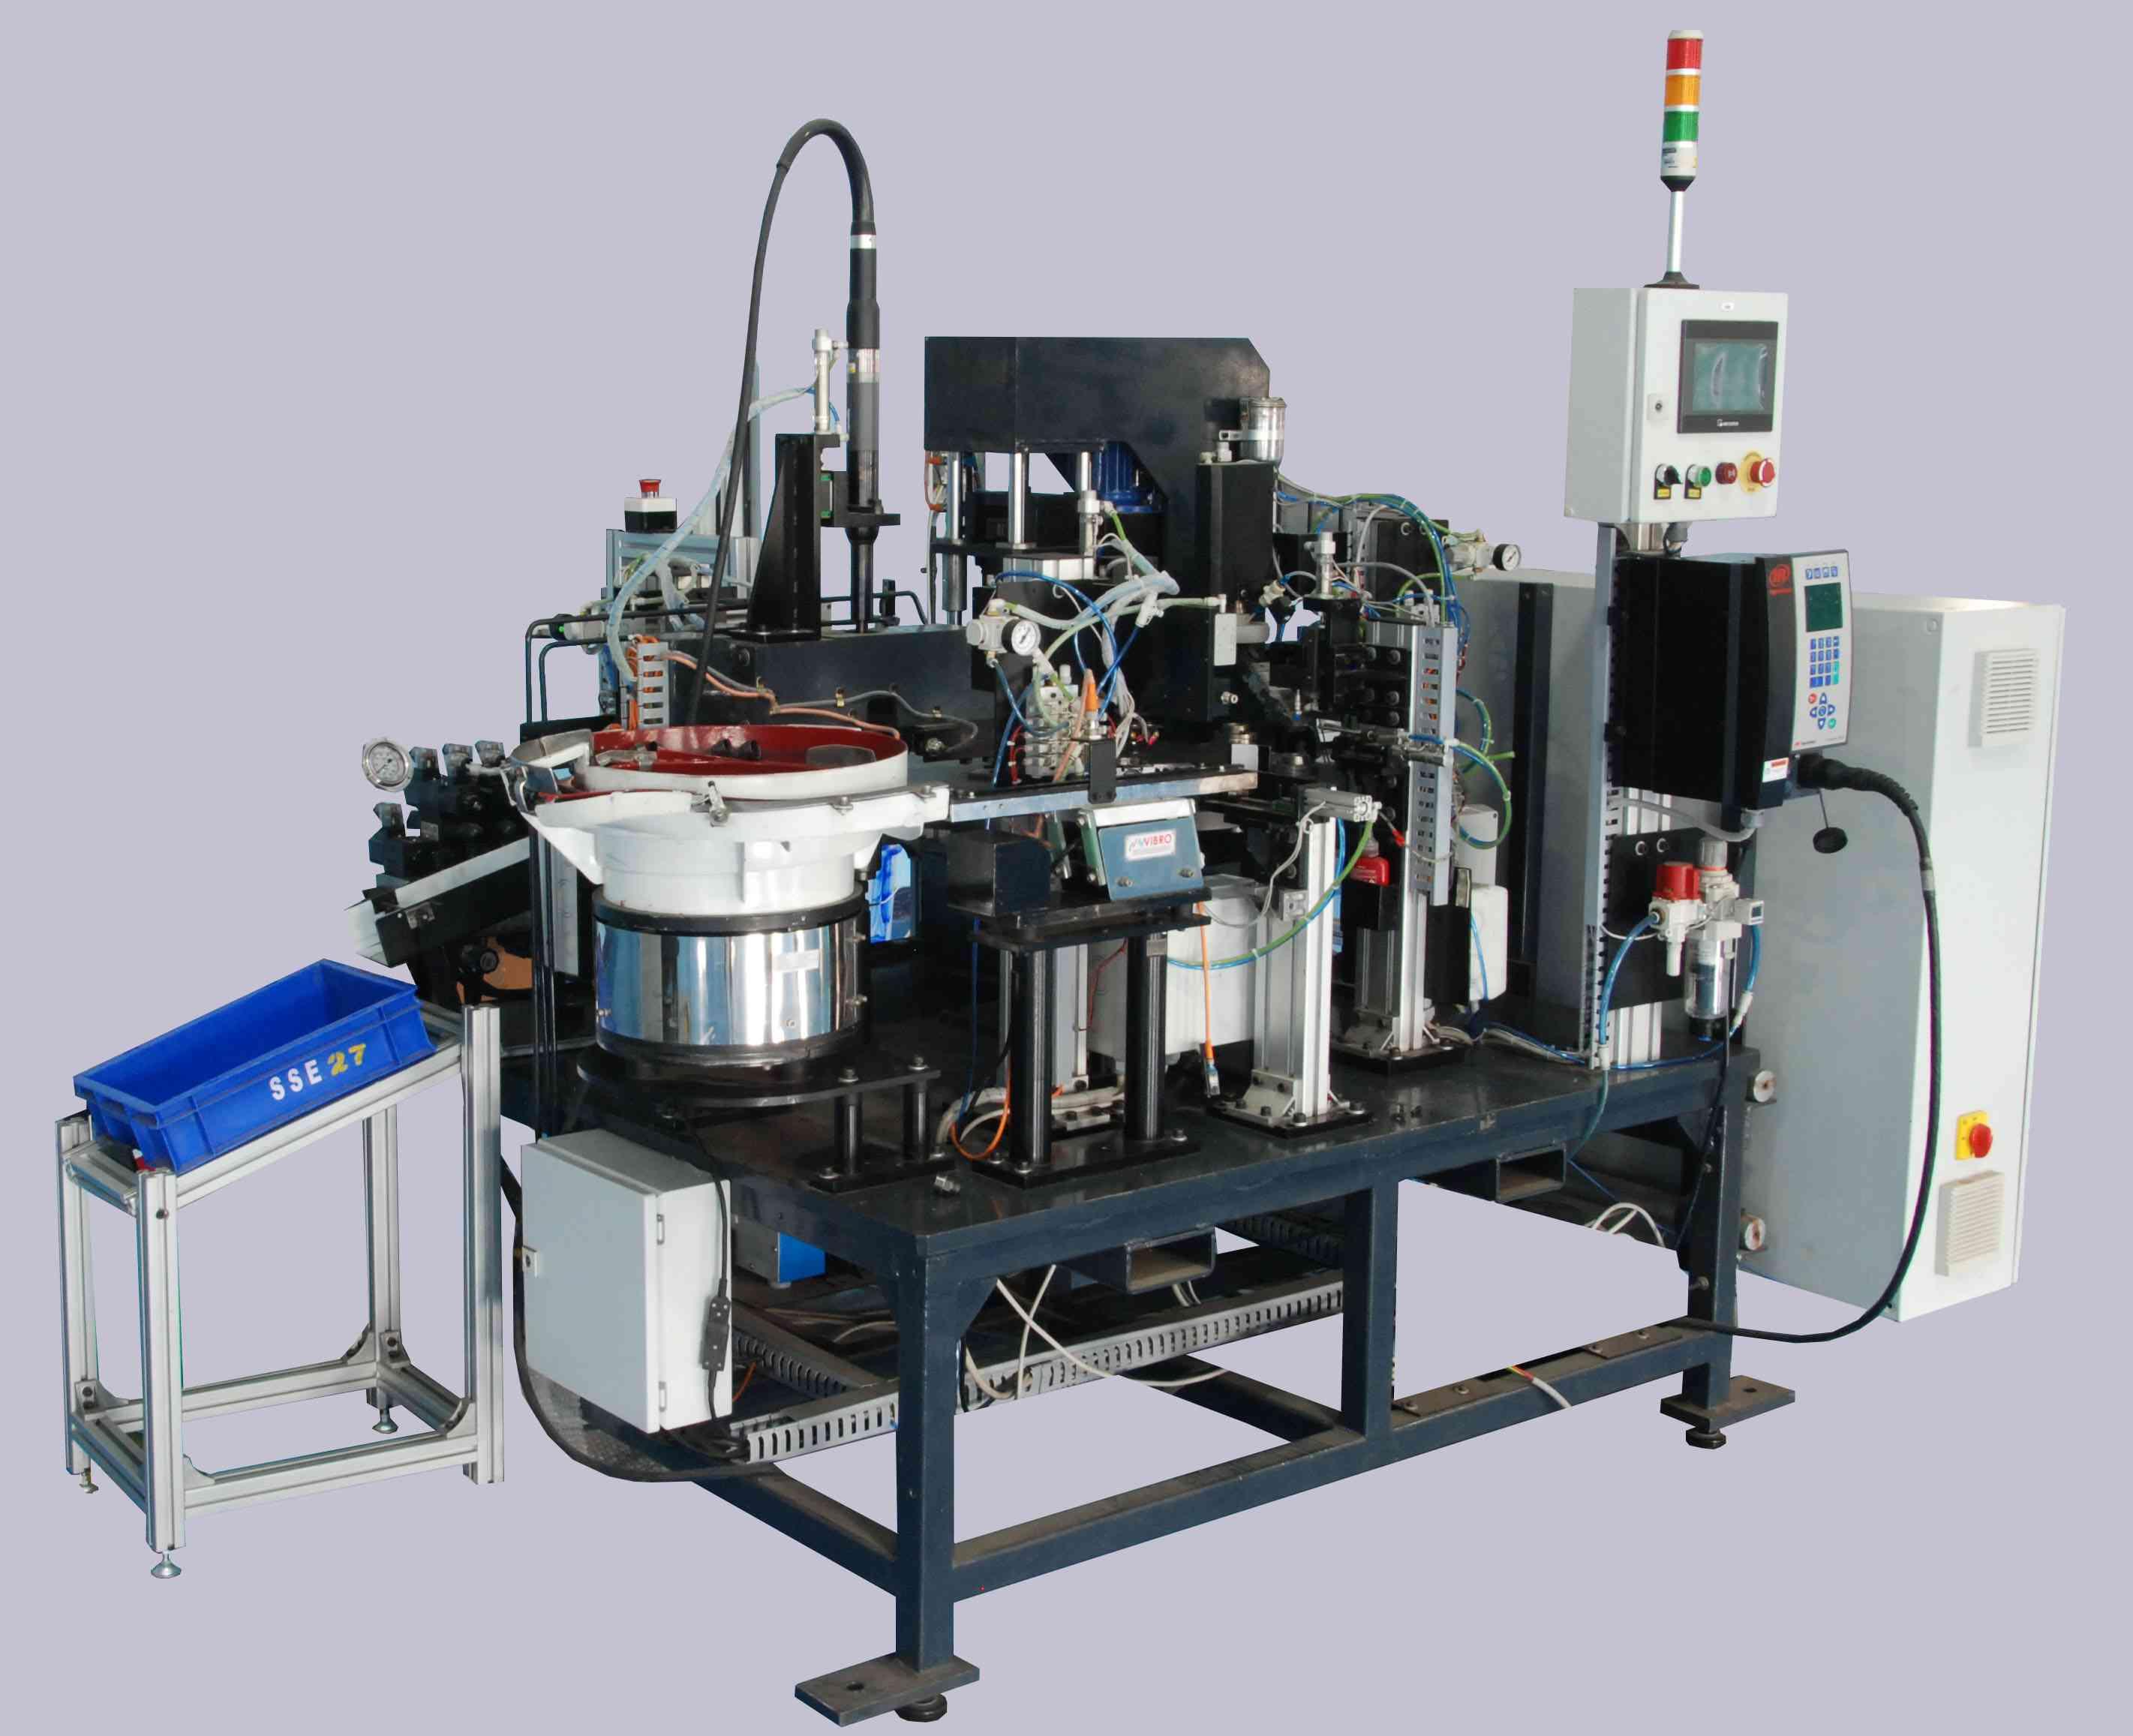 Maini assembly automation_2